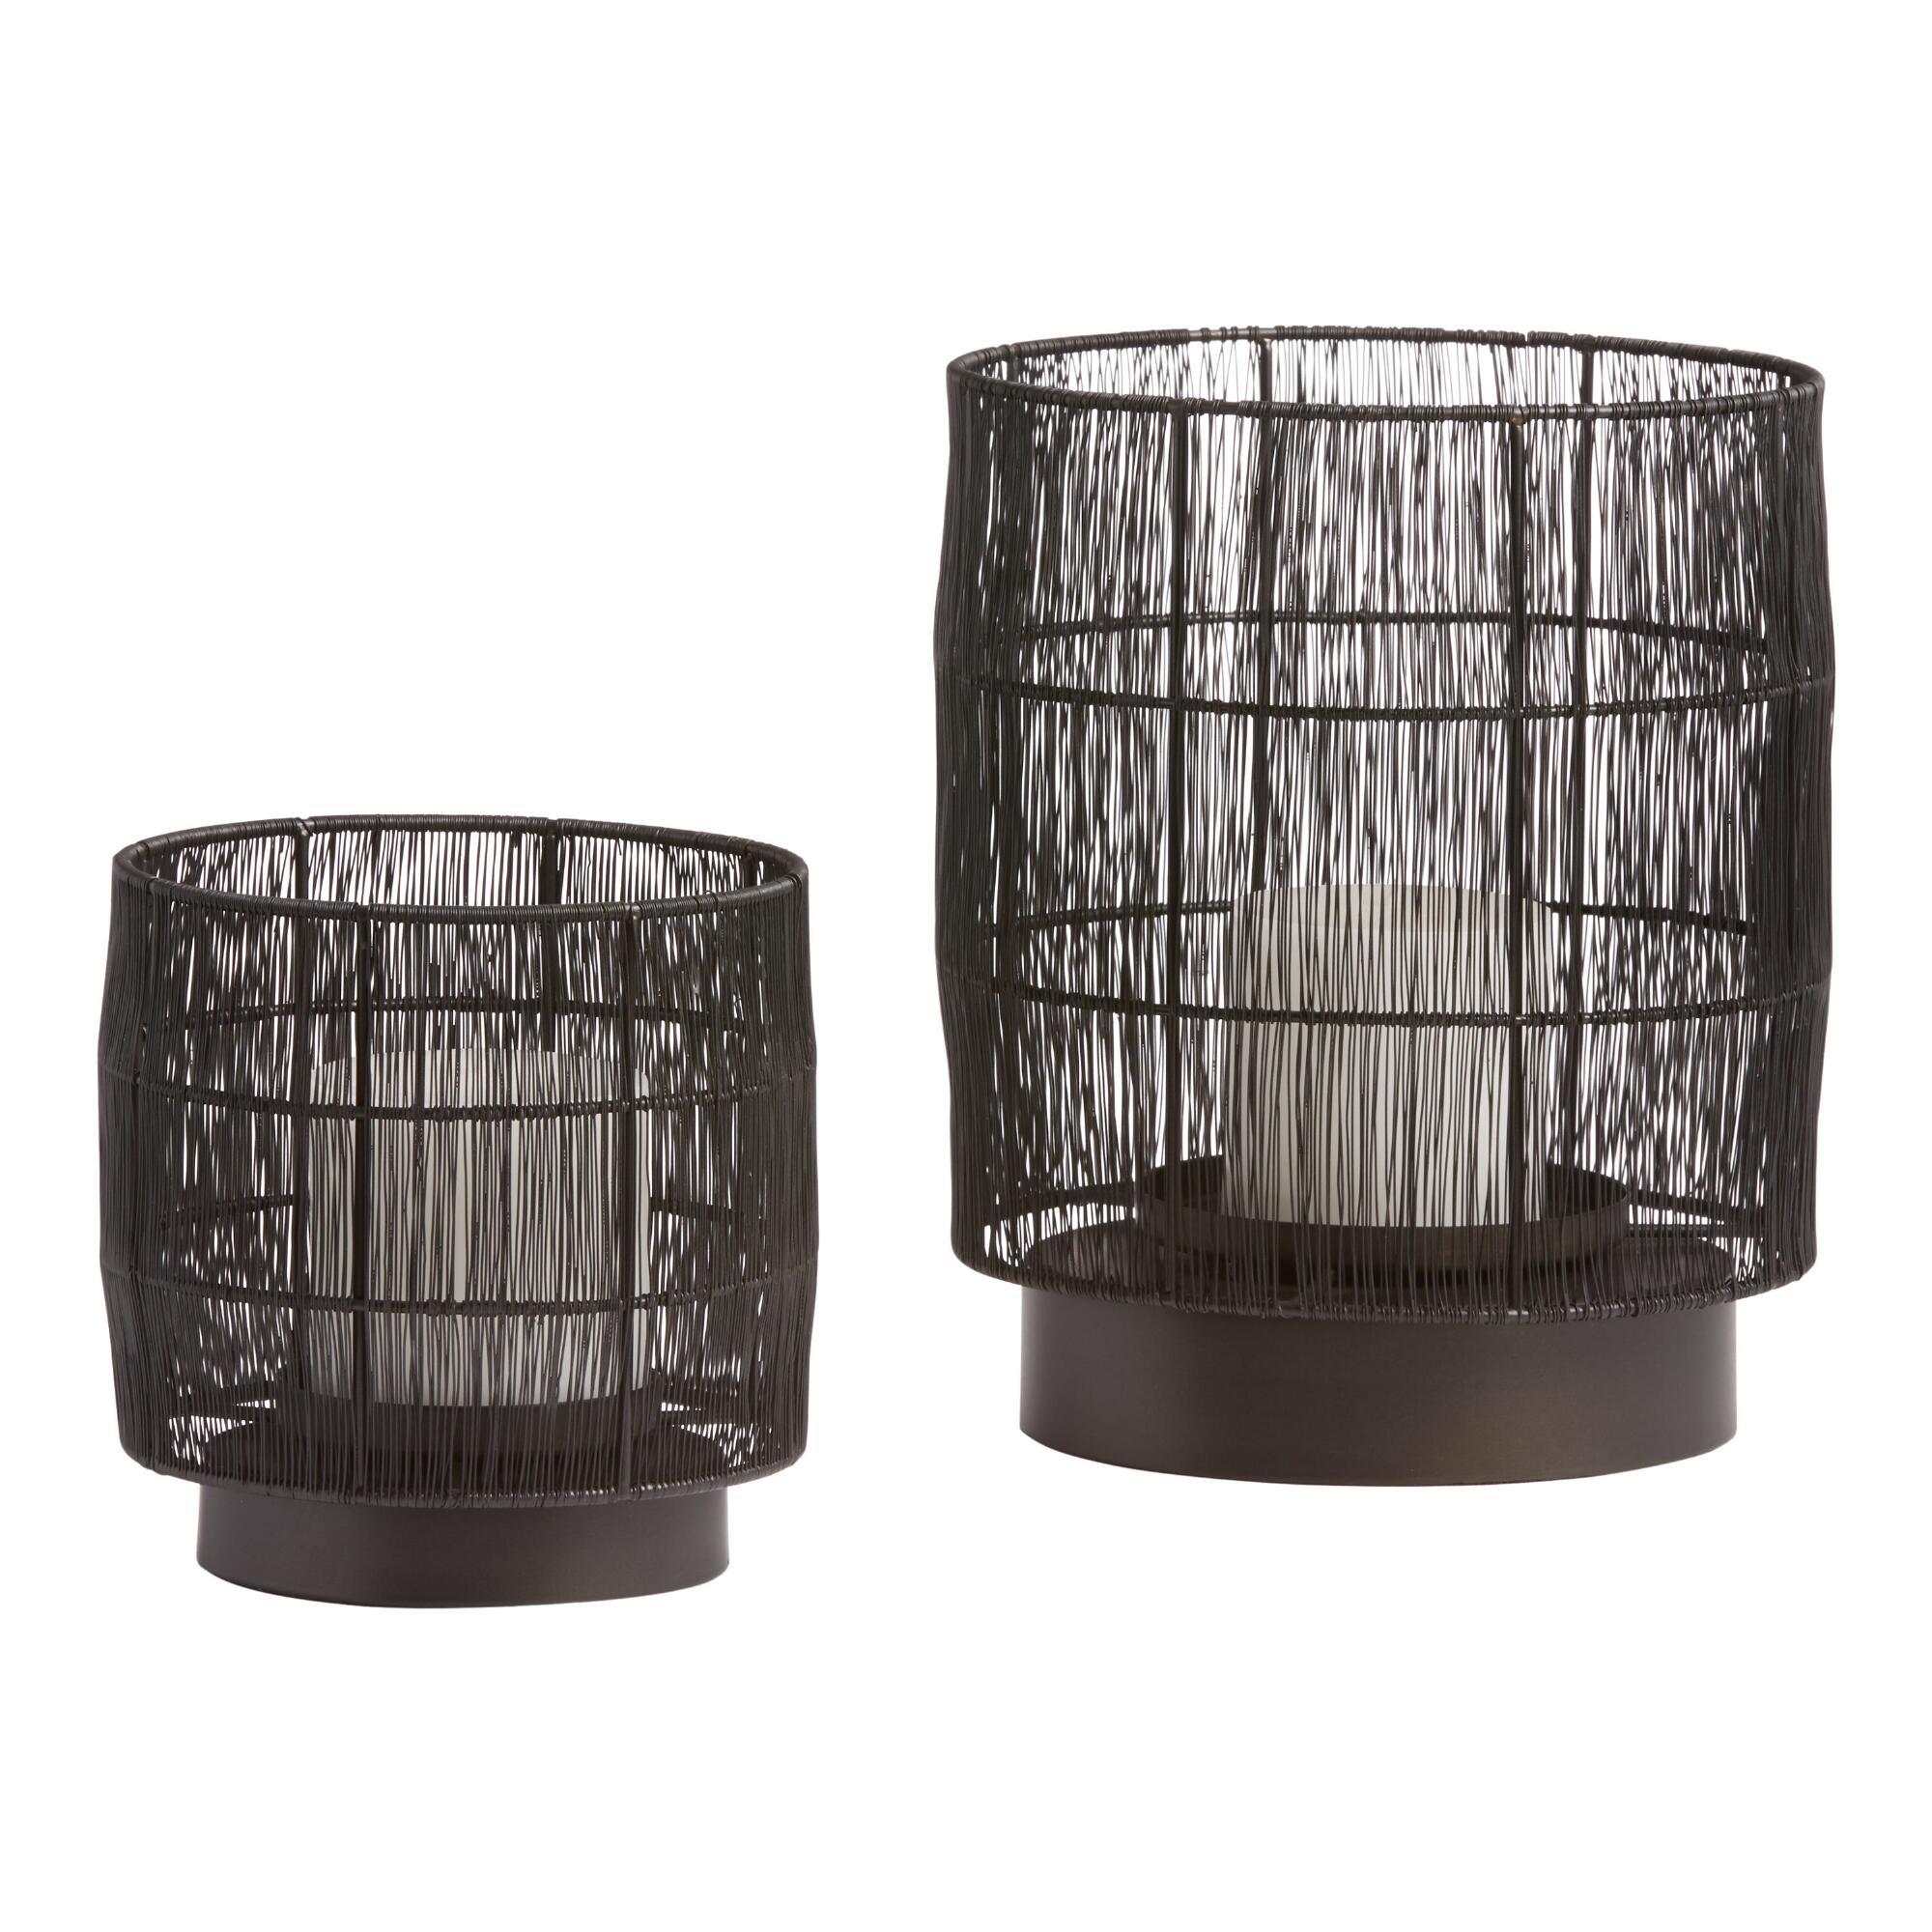 Black Wire Evan Hurricane Candleholder $14.99-$29.99